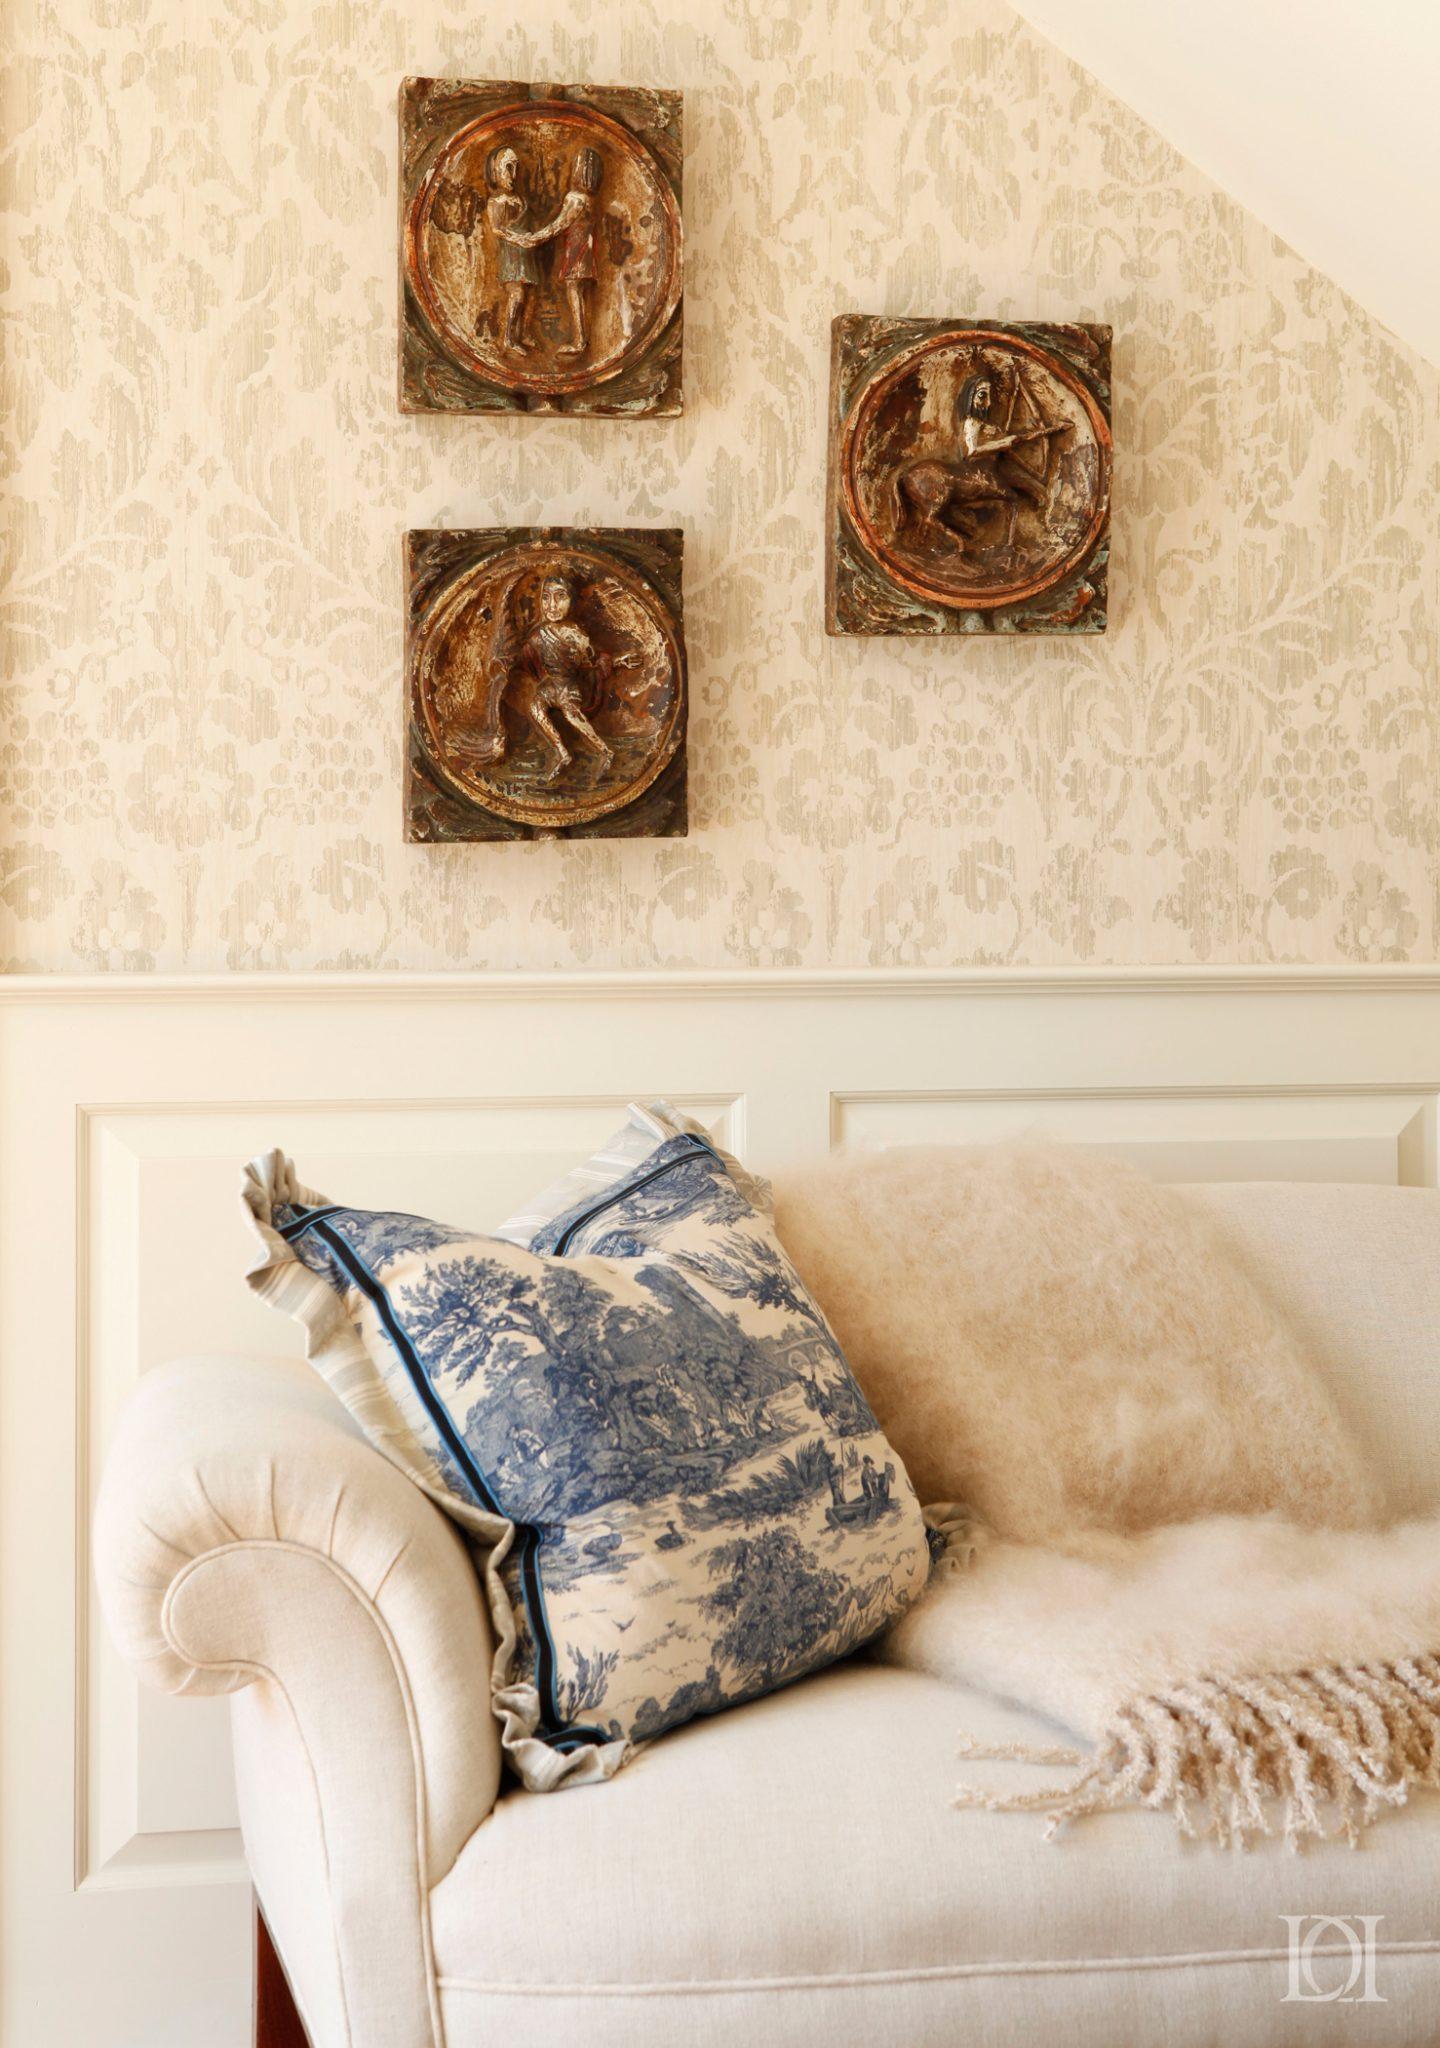 Antique fabric pillows,damask wallpaper, mohair blanket, wainscoting by Deborah Leamann Interior Design